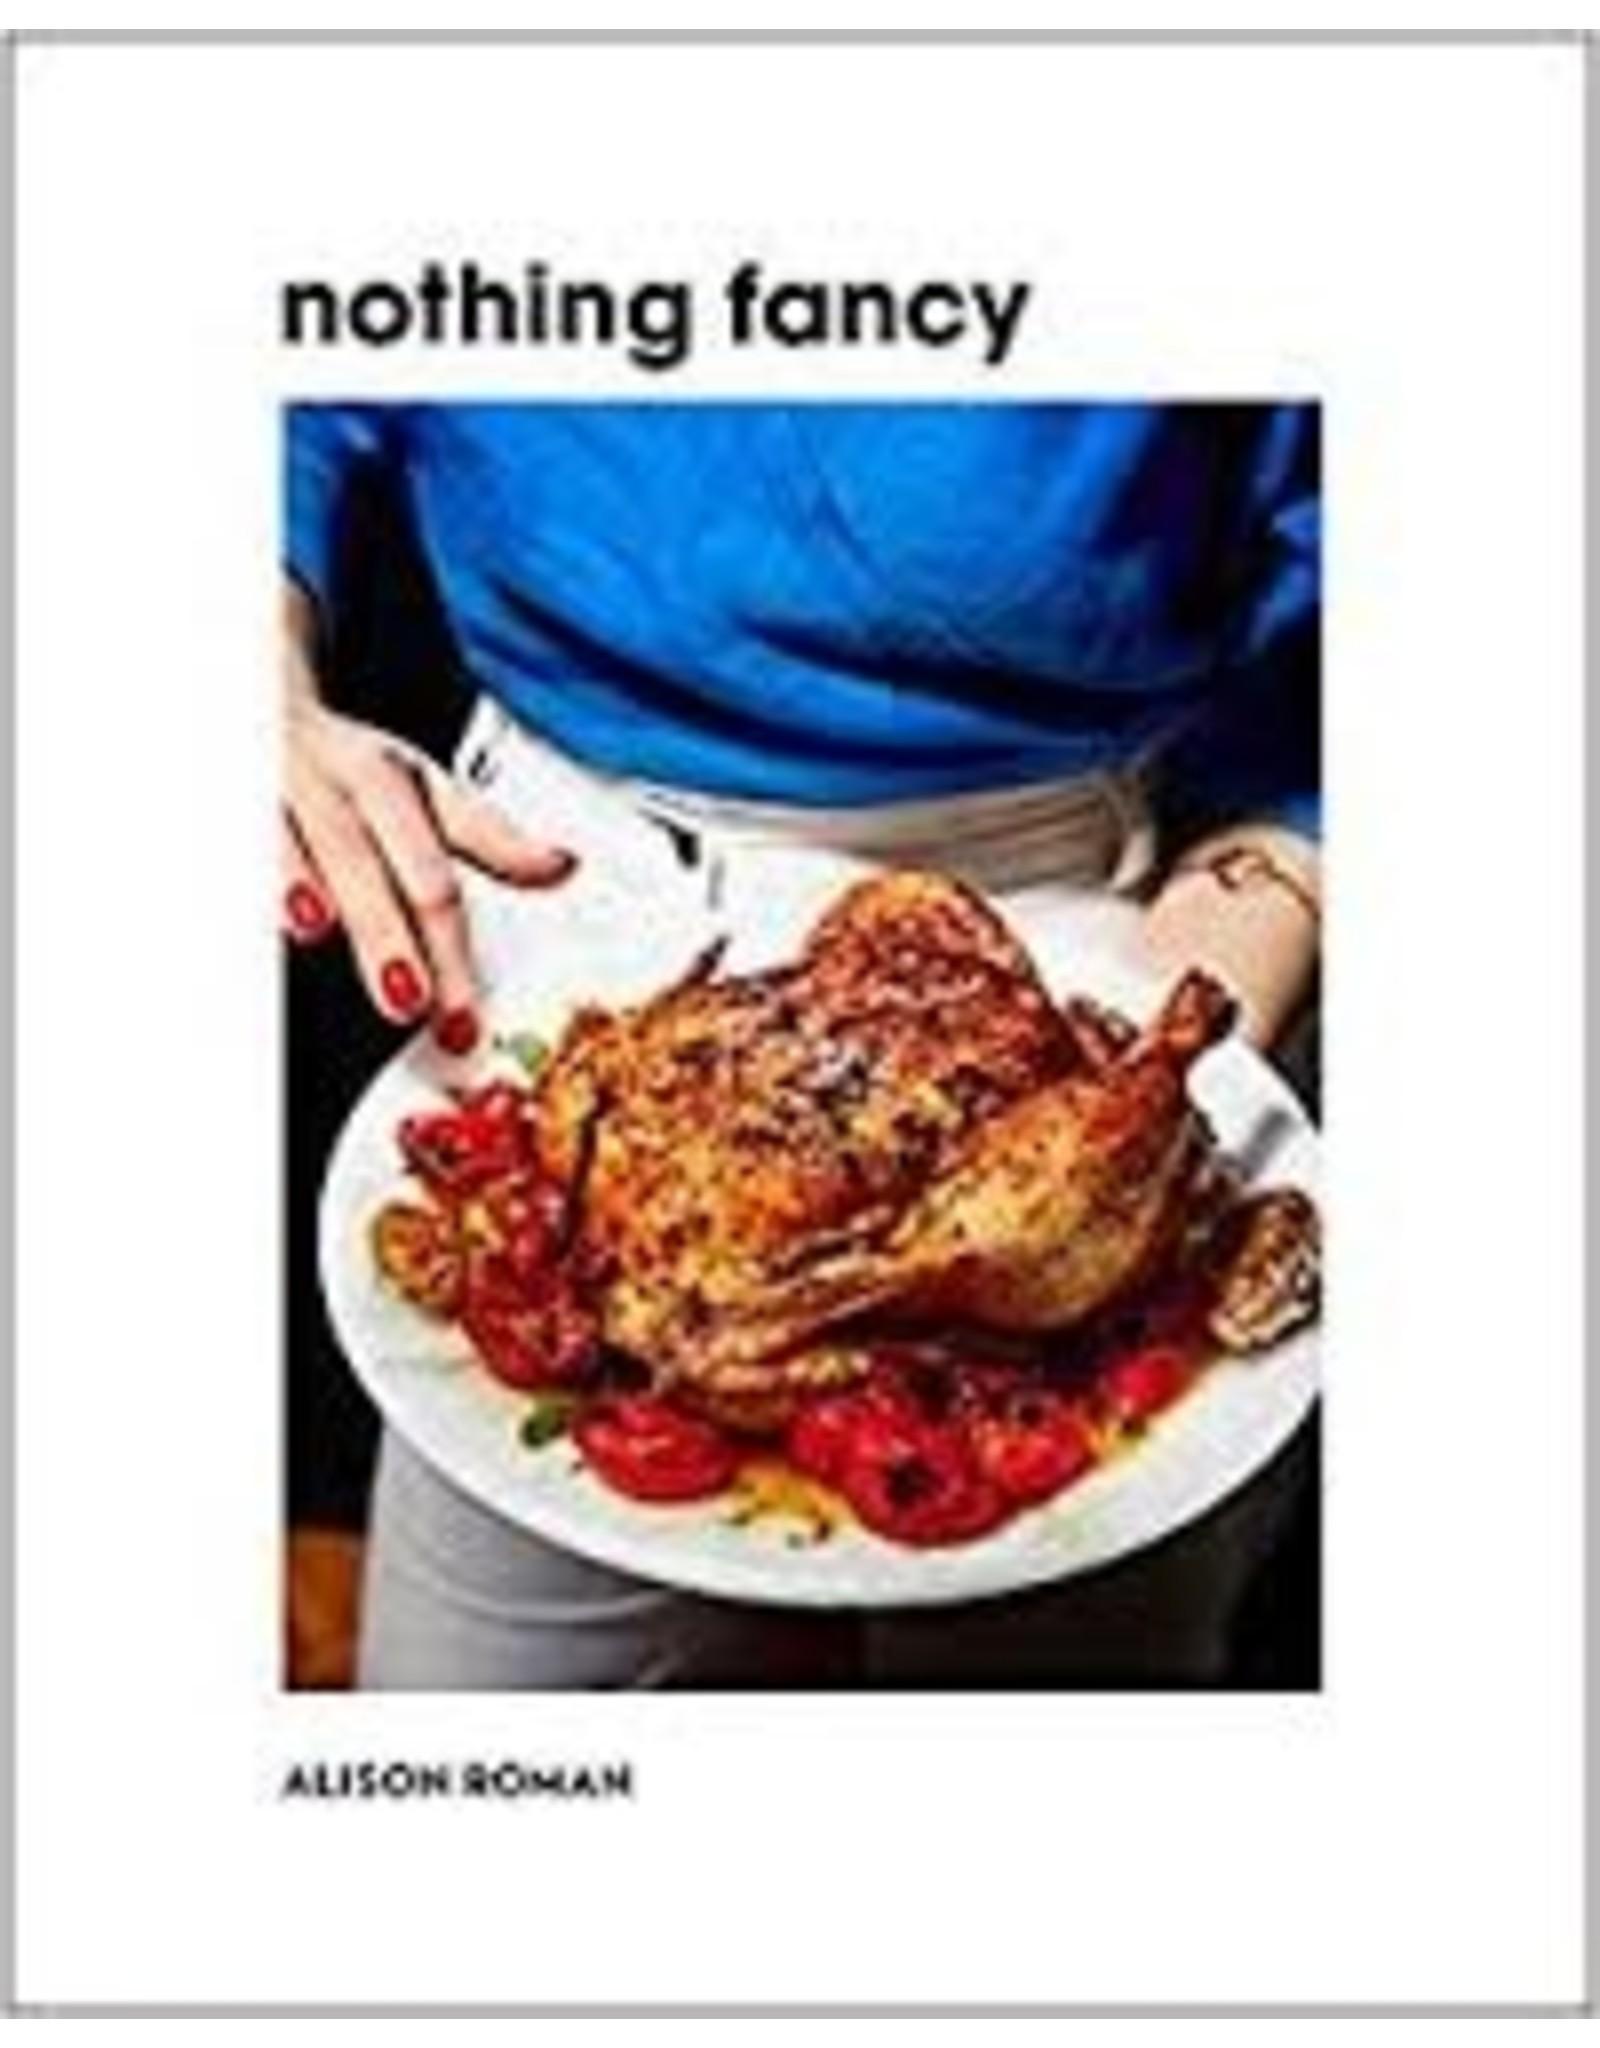 Books Nothing Fancy by Alison Roman